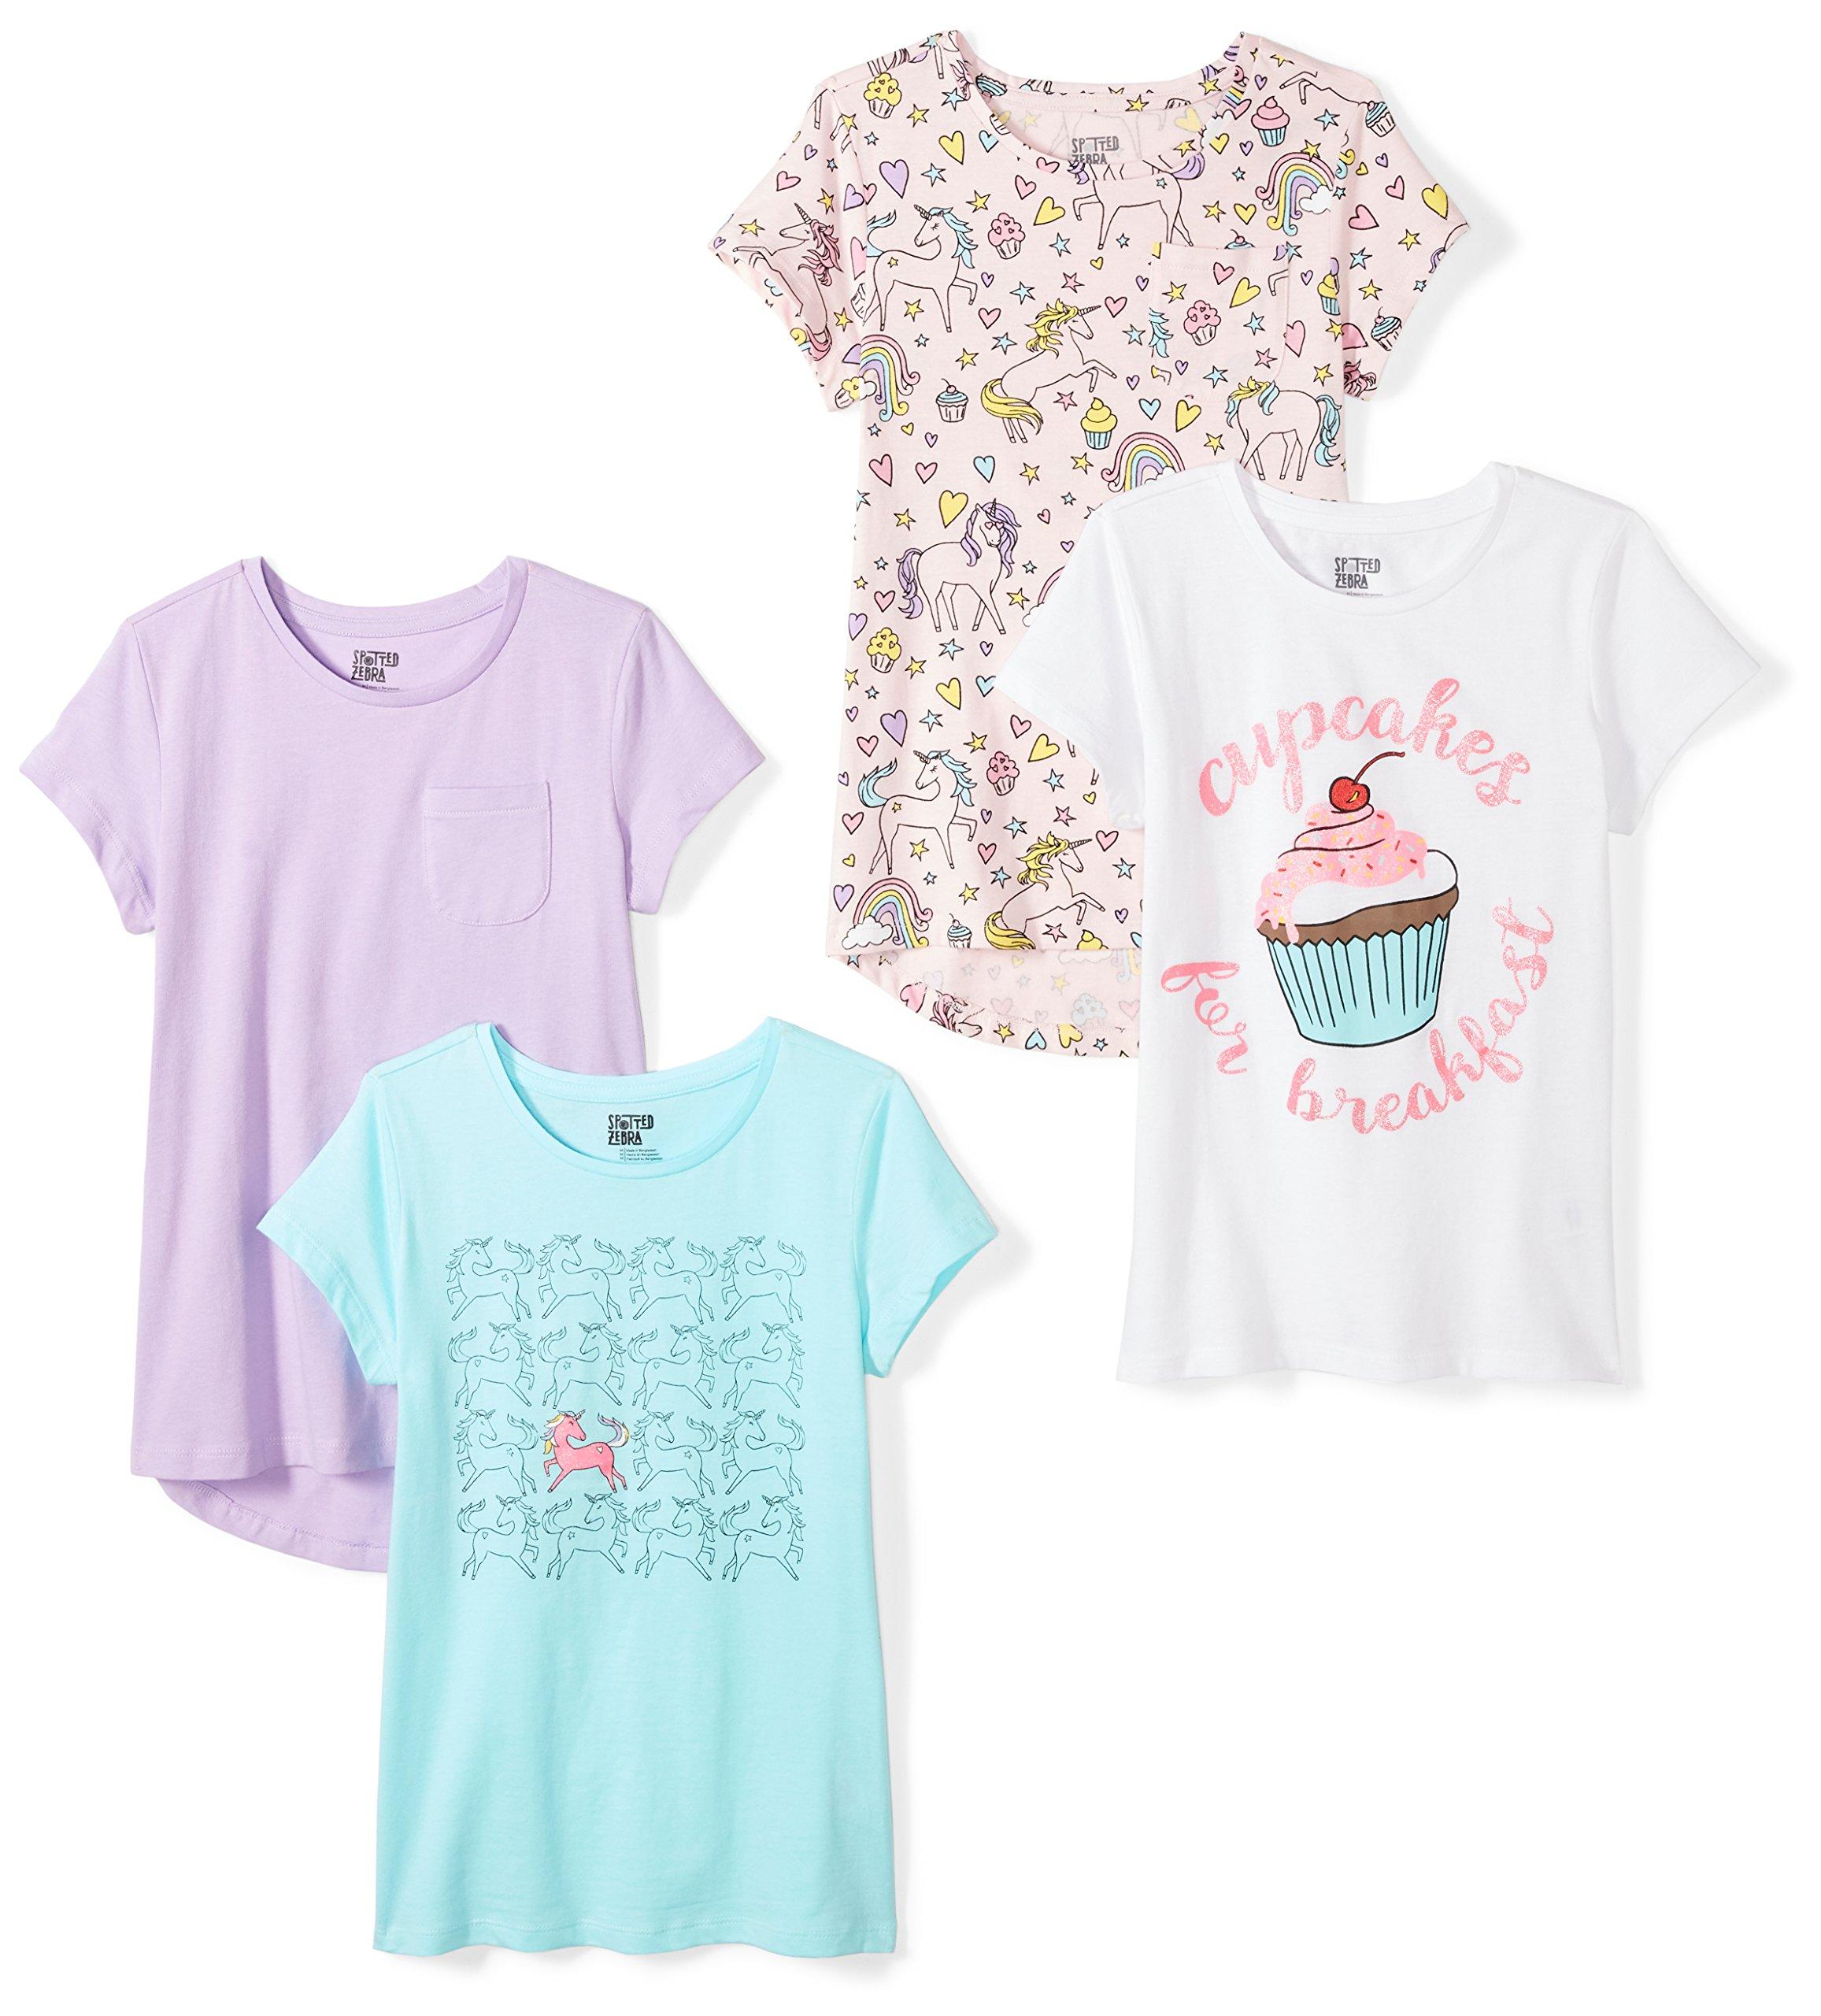 Spotted Zebra Girls' Little 4-Pack Short-Sleeve T-Shirts, Unicorn, Small (6-7)